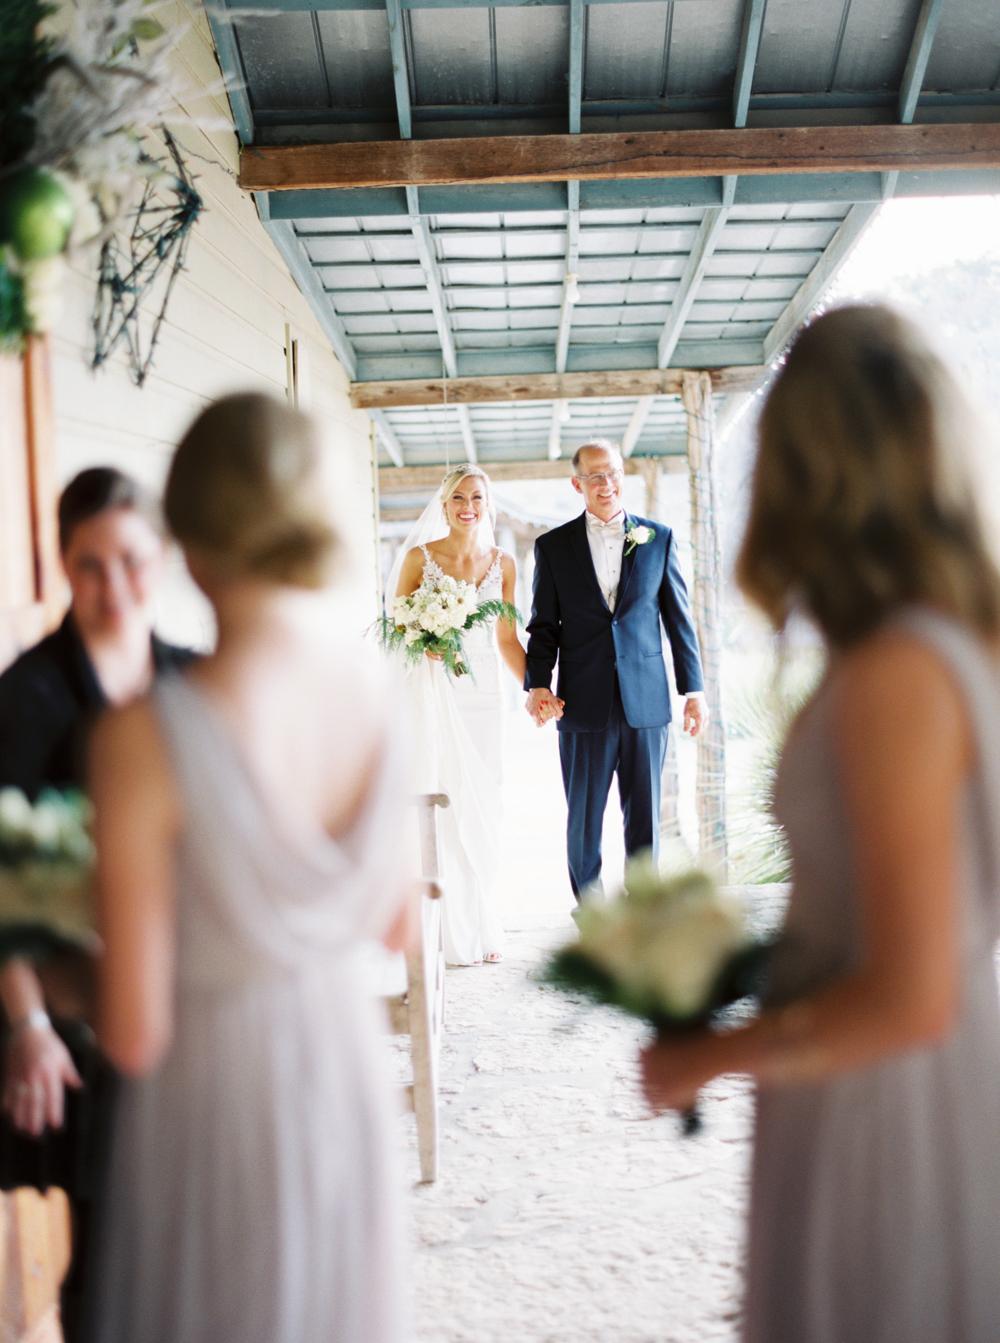 BOERNE WEDDING PHOTOGRAPHER-16.jpg